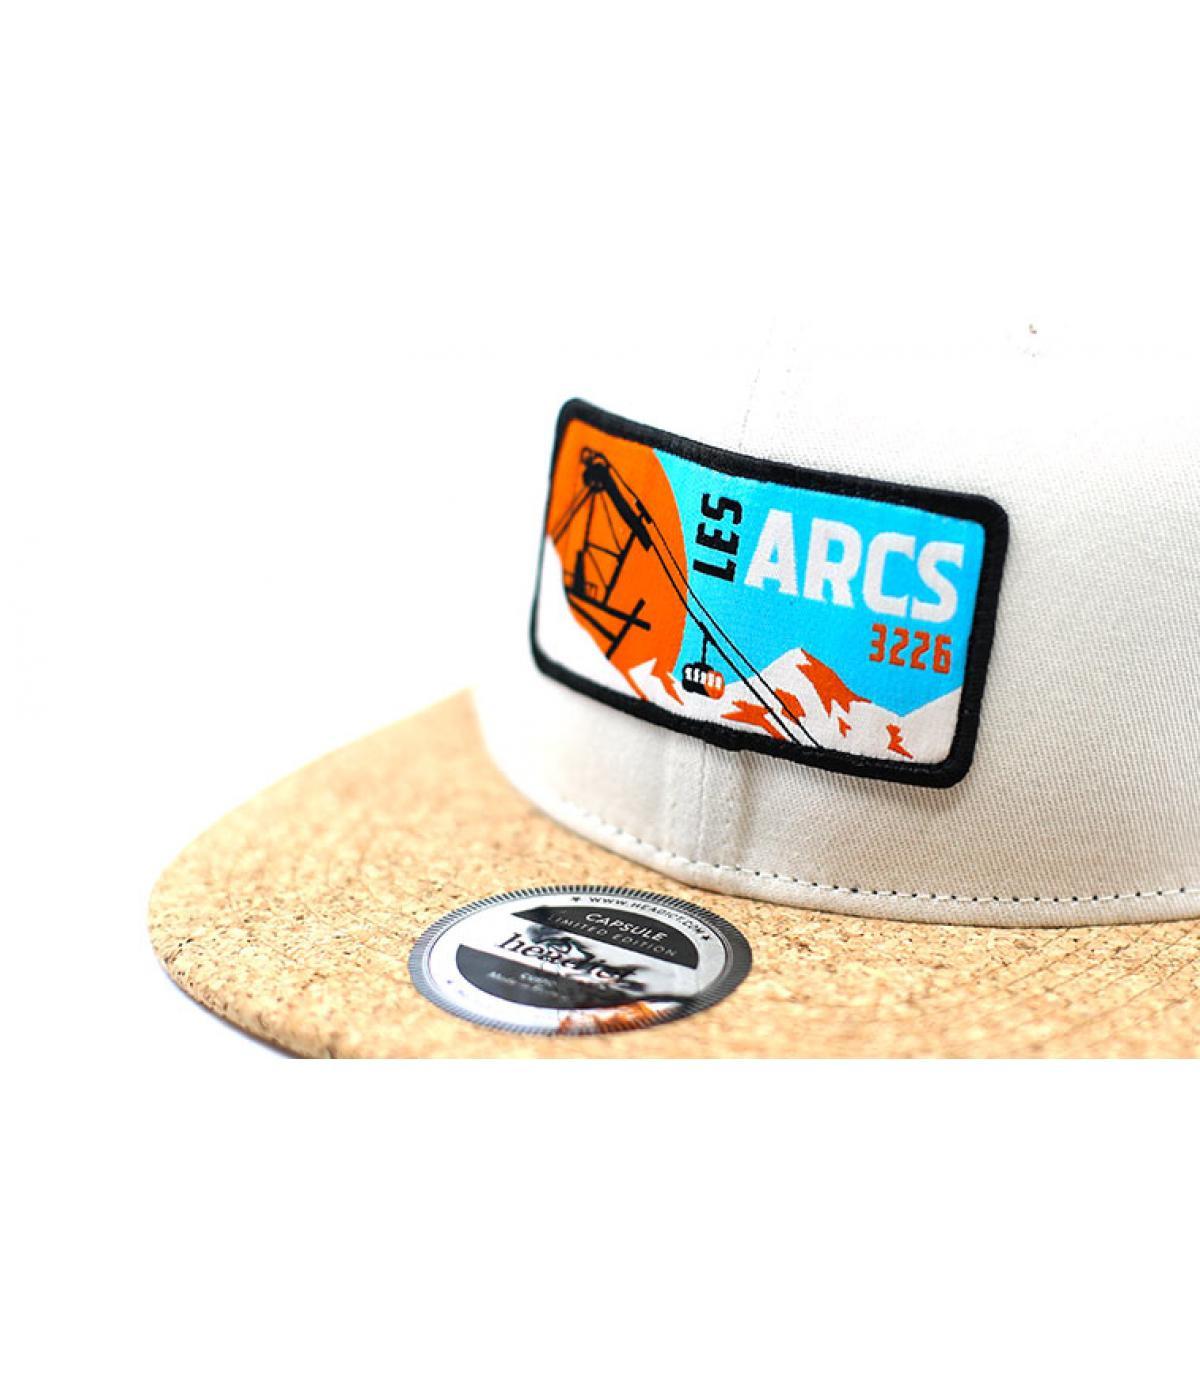 Dettagli Snapback Les Arcs - image 3